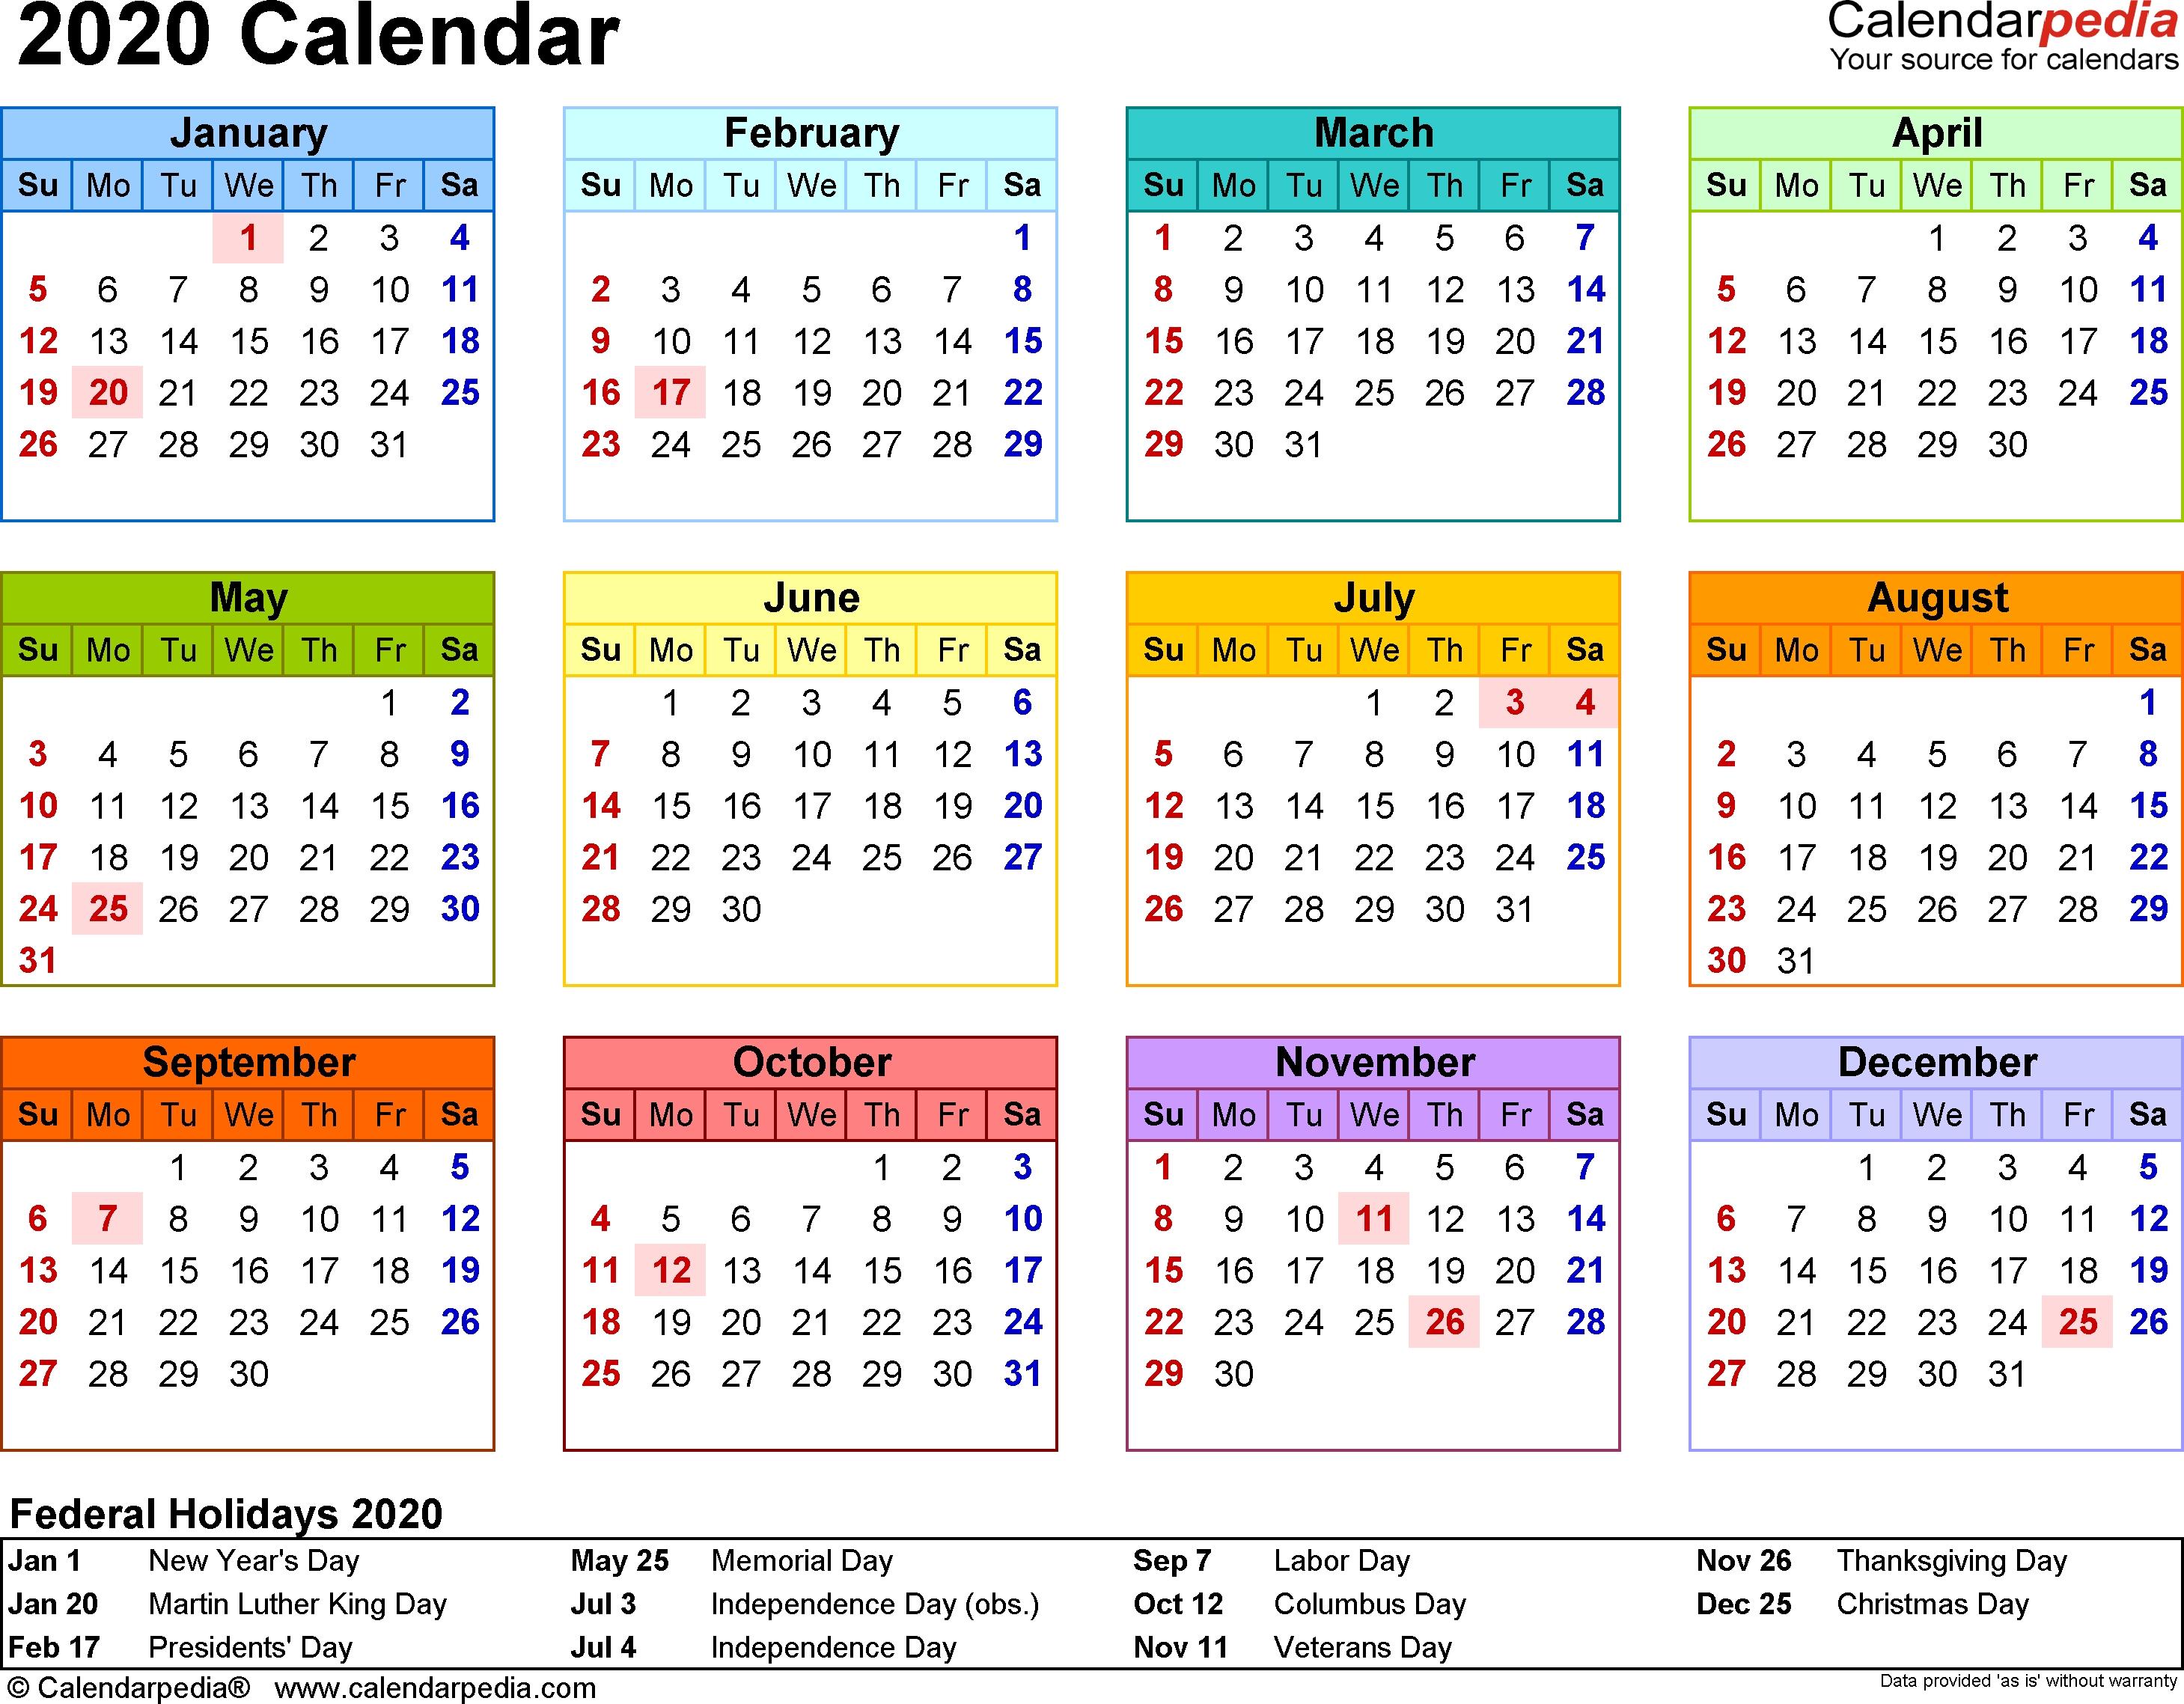 2020 Calendar - 18 Free Printable Word Calendar Templates-Microsoft Calendar Templates 2020